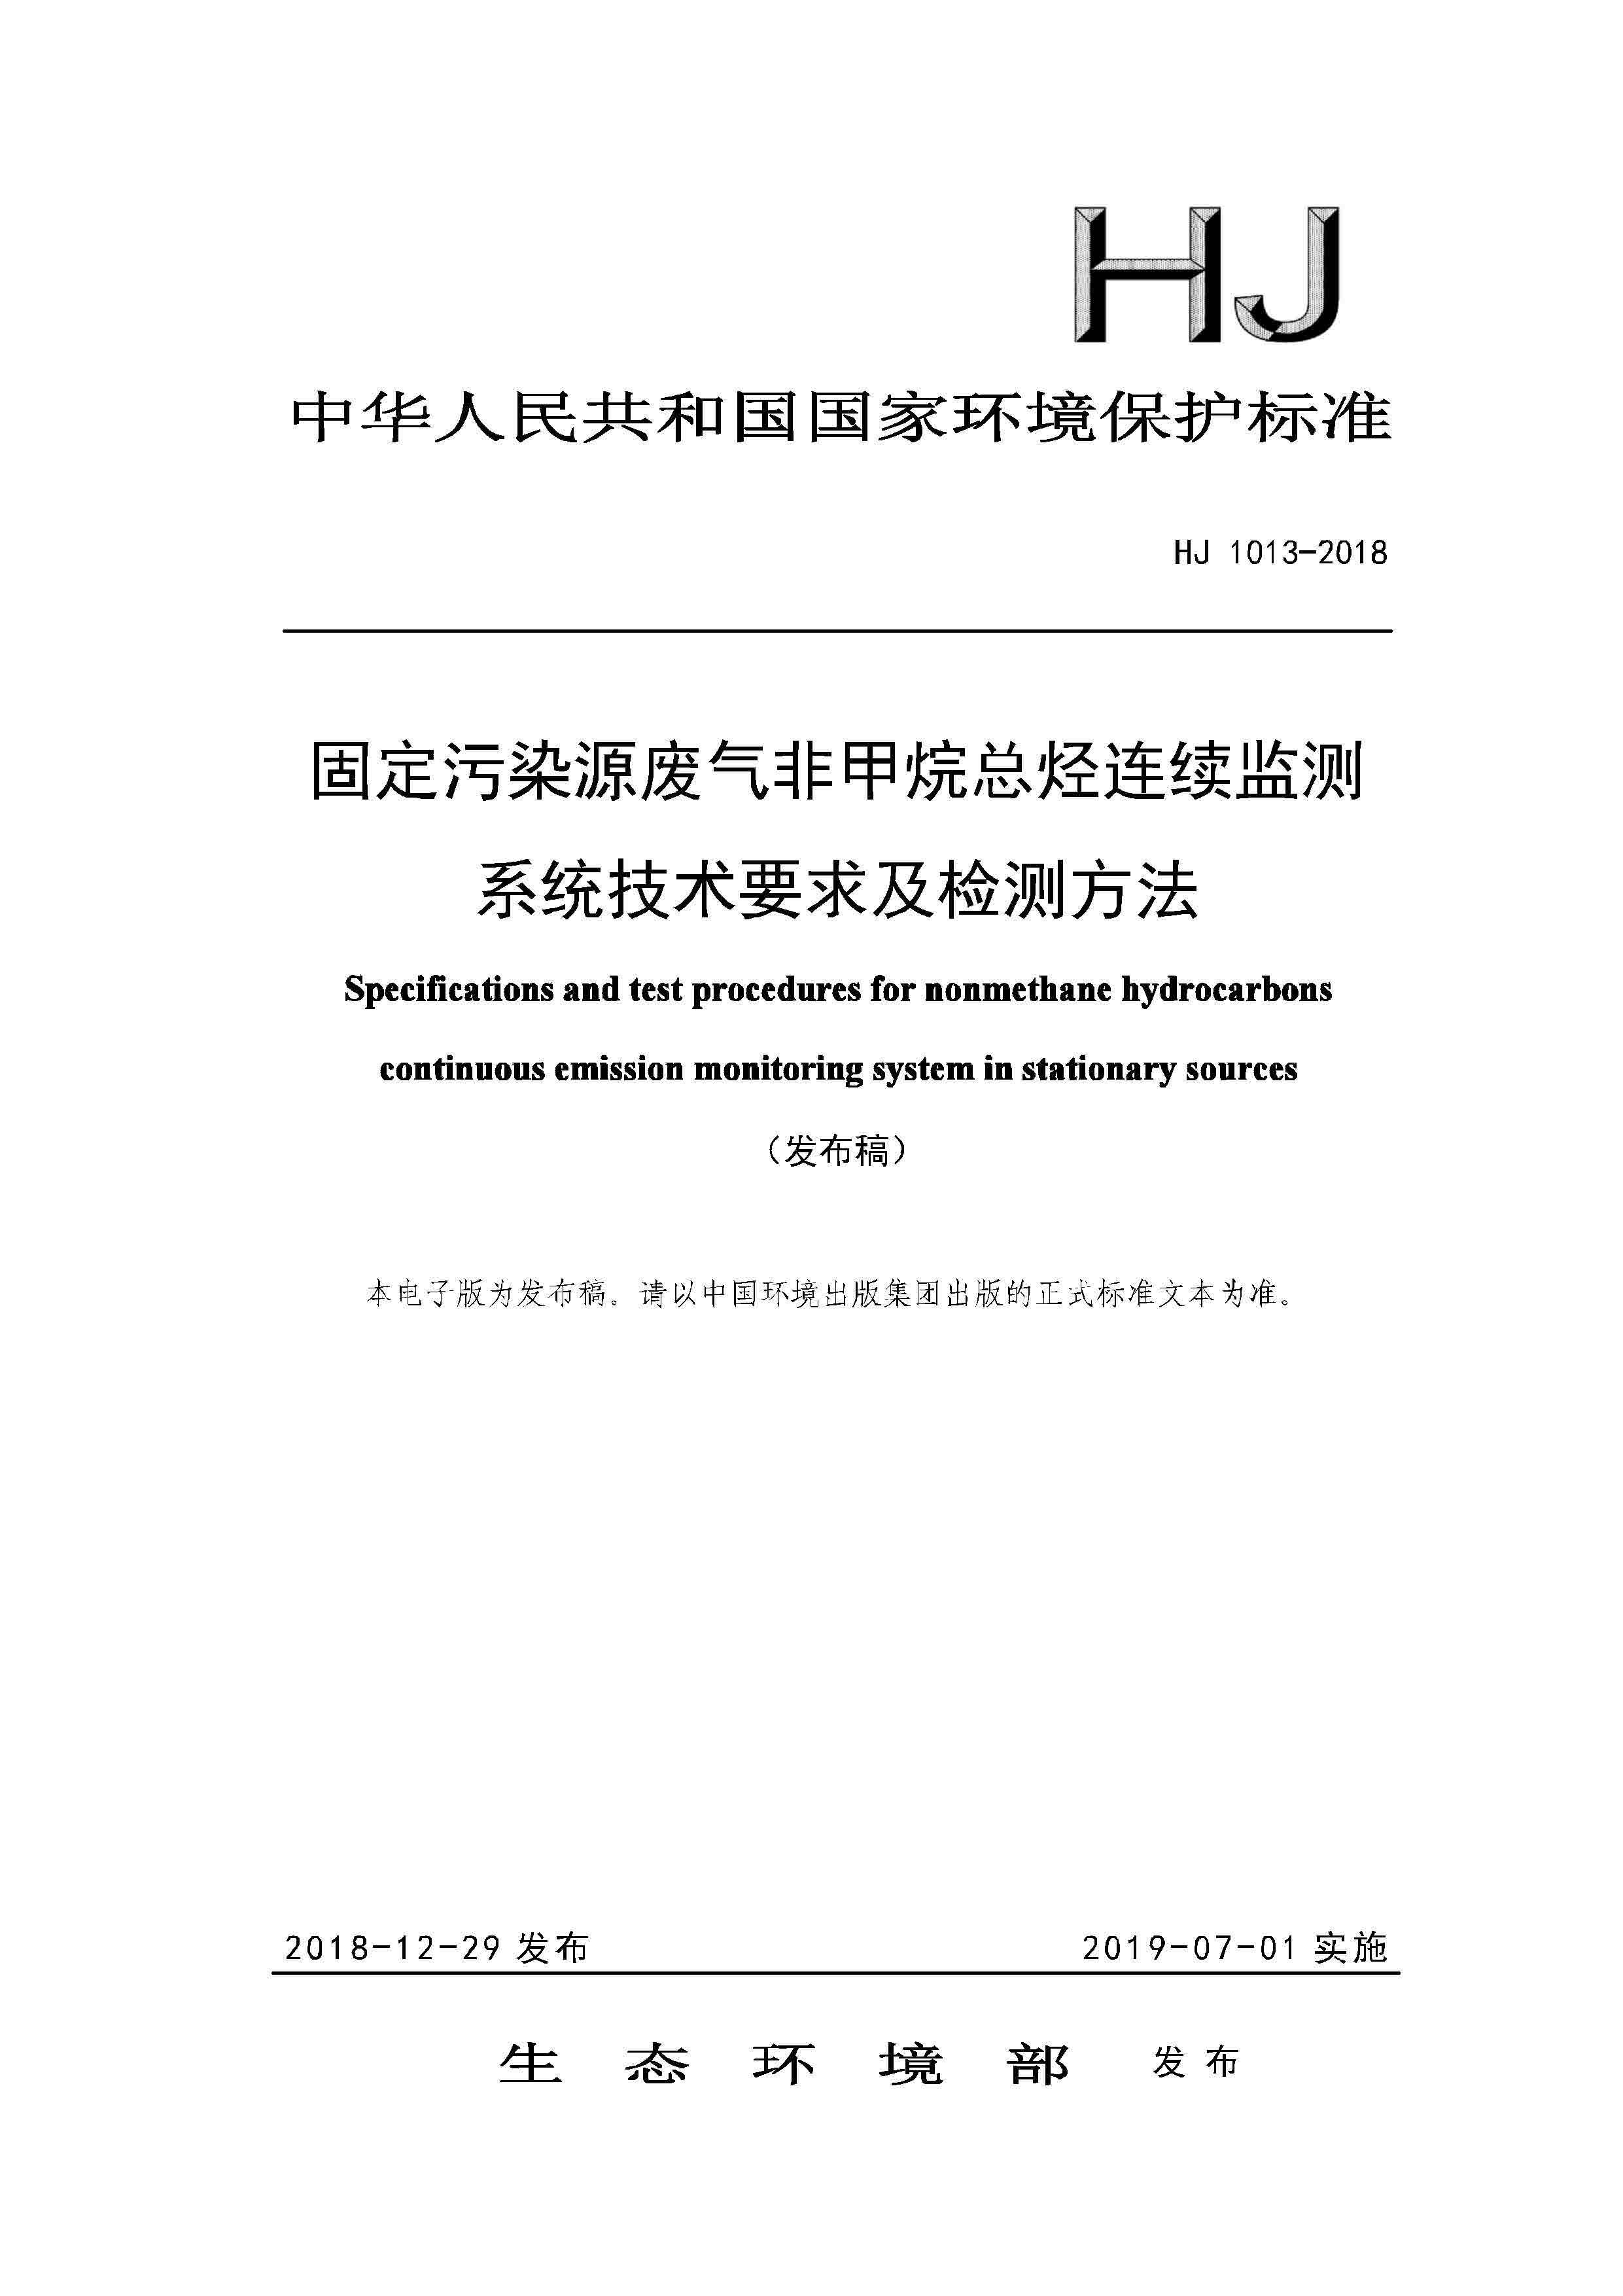 HJ 1013-2018 固定污染源废气非甲烷总烃连续监测系统技术要求及检测方法